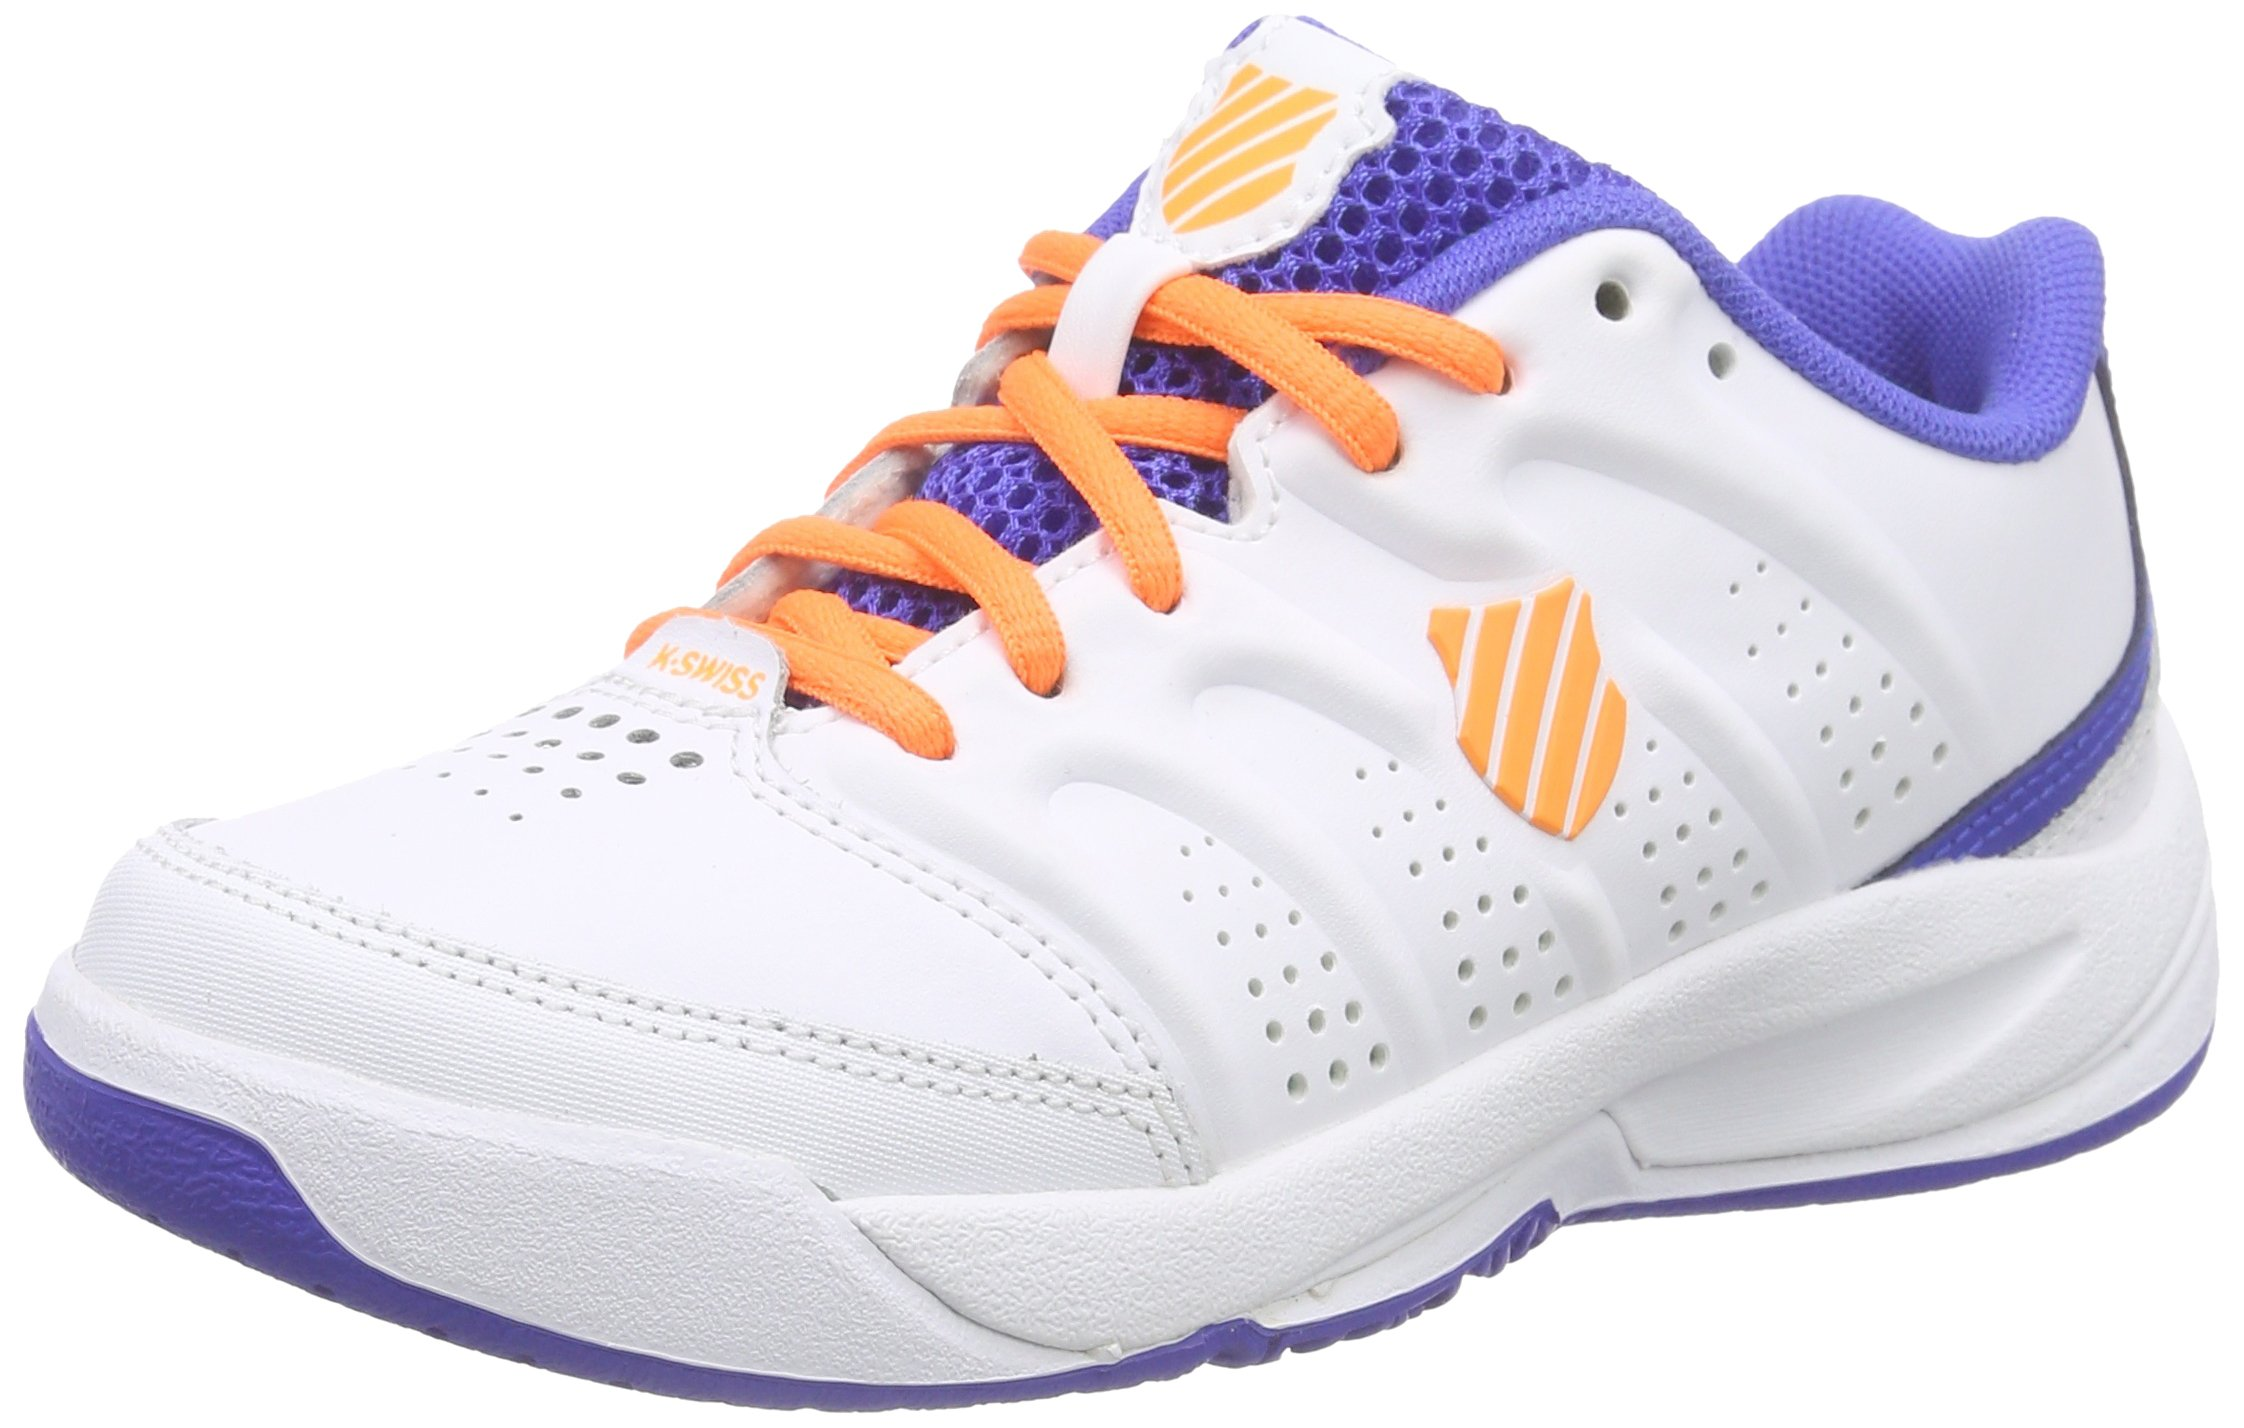 K-Swiss Ultrascendor Omni Junior Tennis Shoes, White/Blue, J11.5